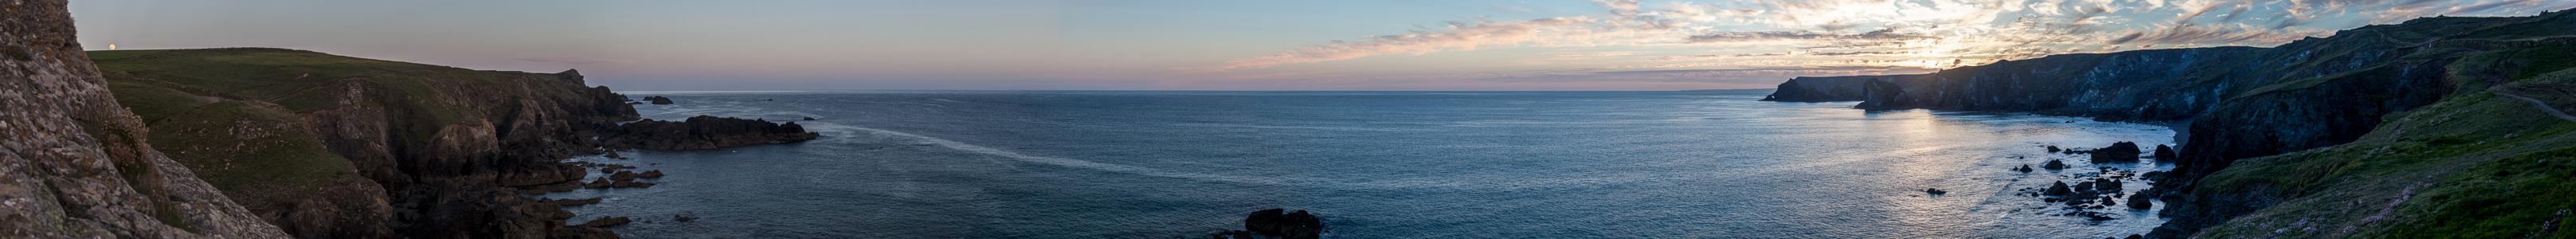 Lizard Pentreath Beach, Ärmelkanal (English Channel)